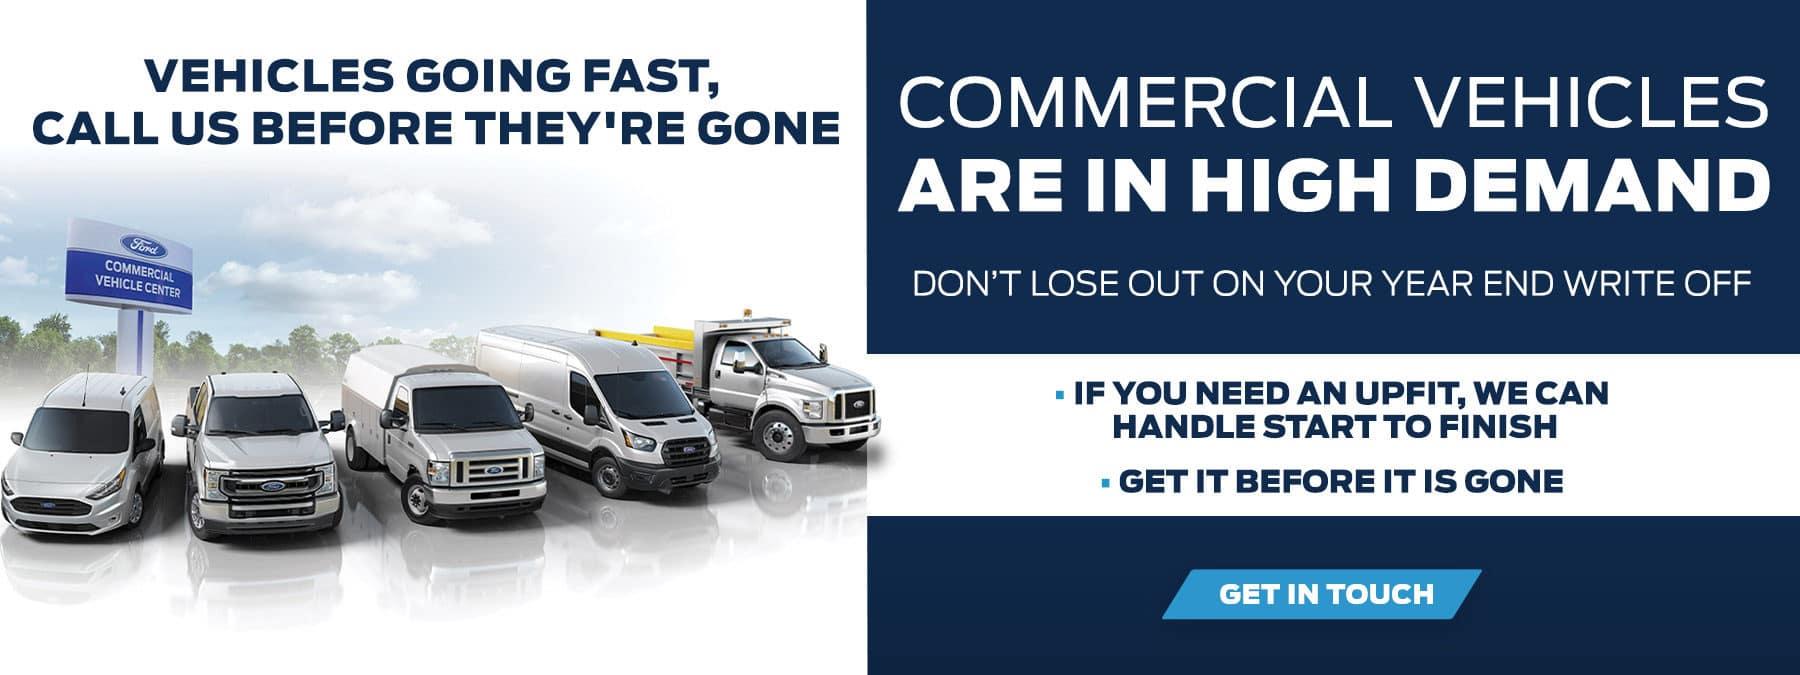 LAFFORD_commercial_1800x675_slide_10-21